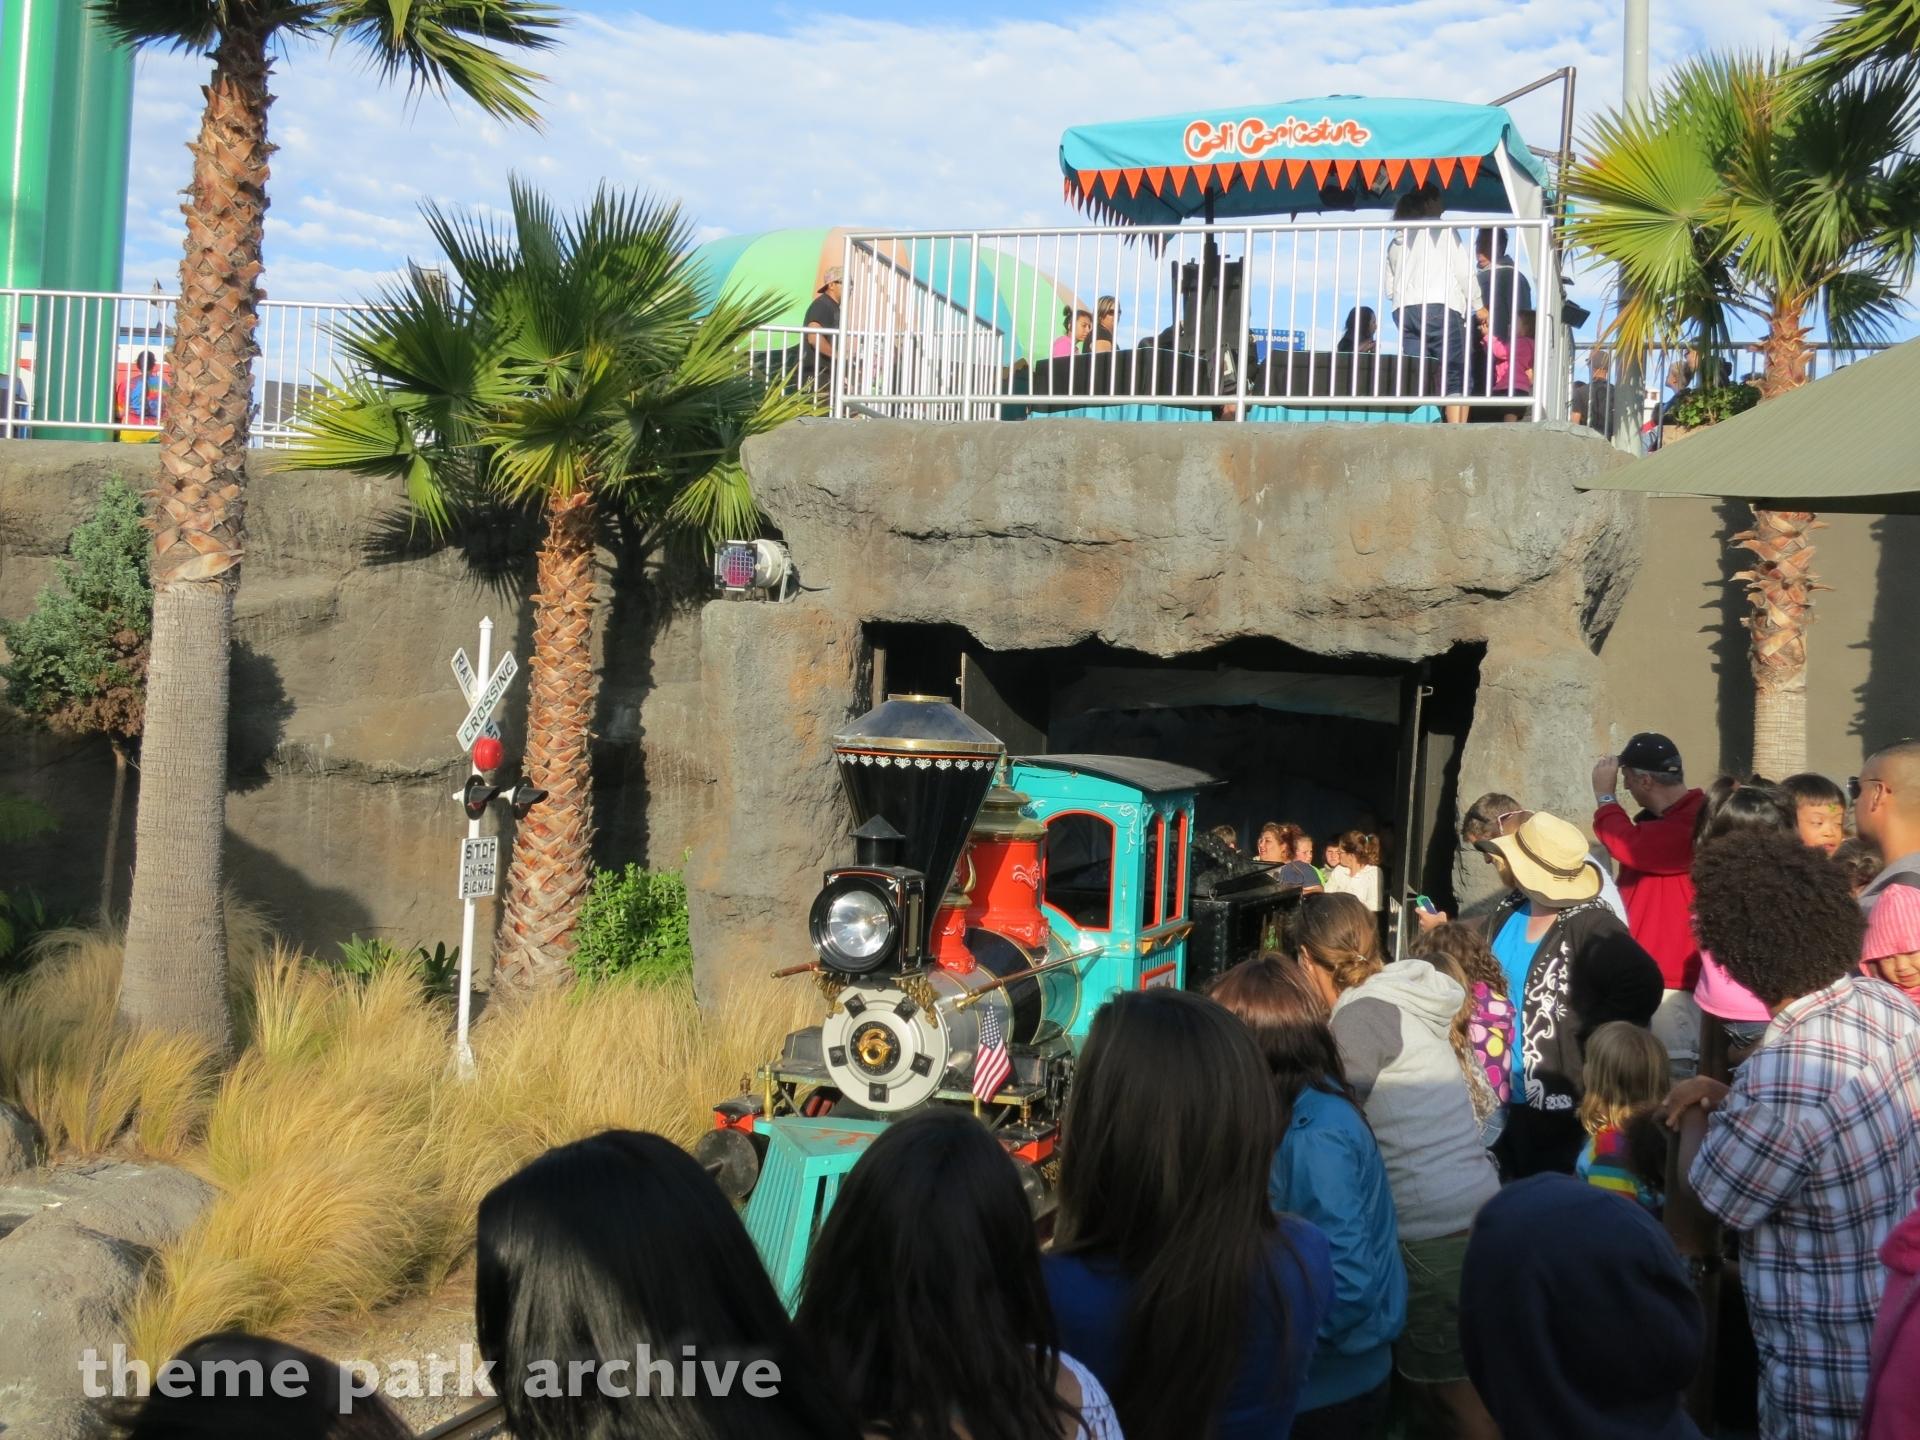 Cave Train Adventure At Santa Cruz Beach Boardwalk Theme Park Archive